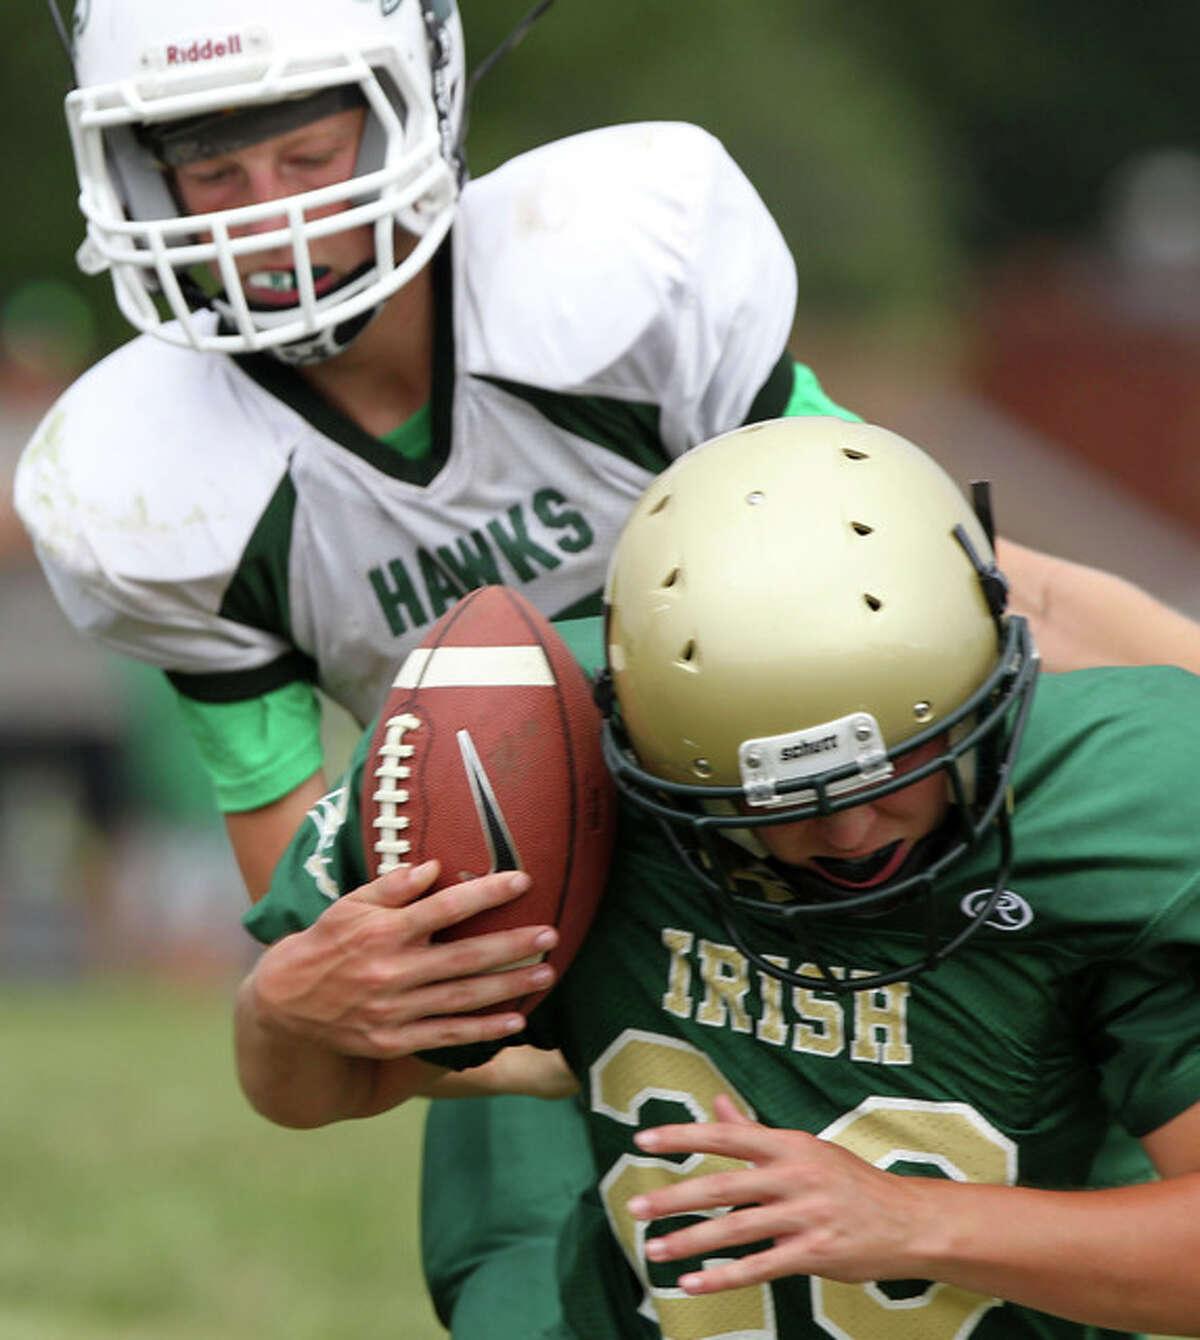 Jason Birdsell of the Junior Irish football team intercepts a pass during a game against Carrollton Saturday at Virginia.